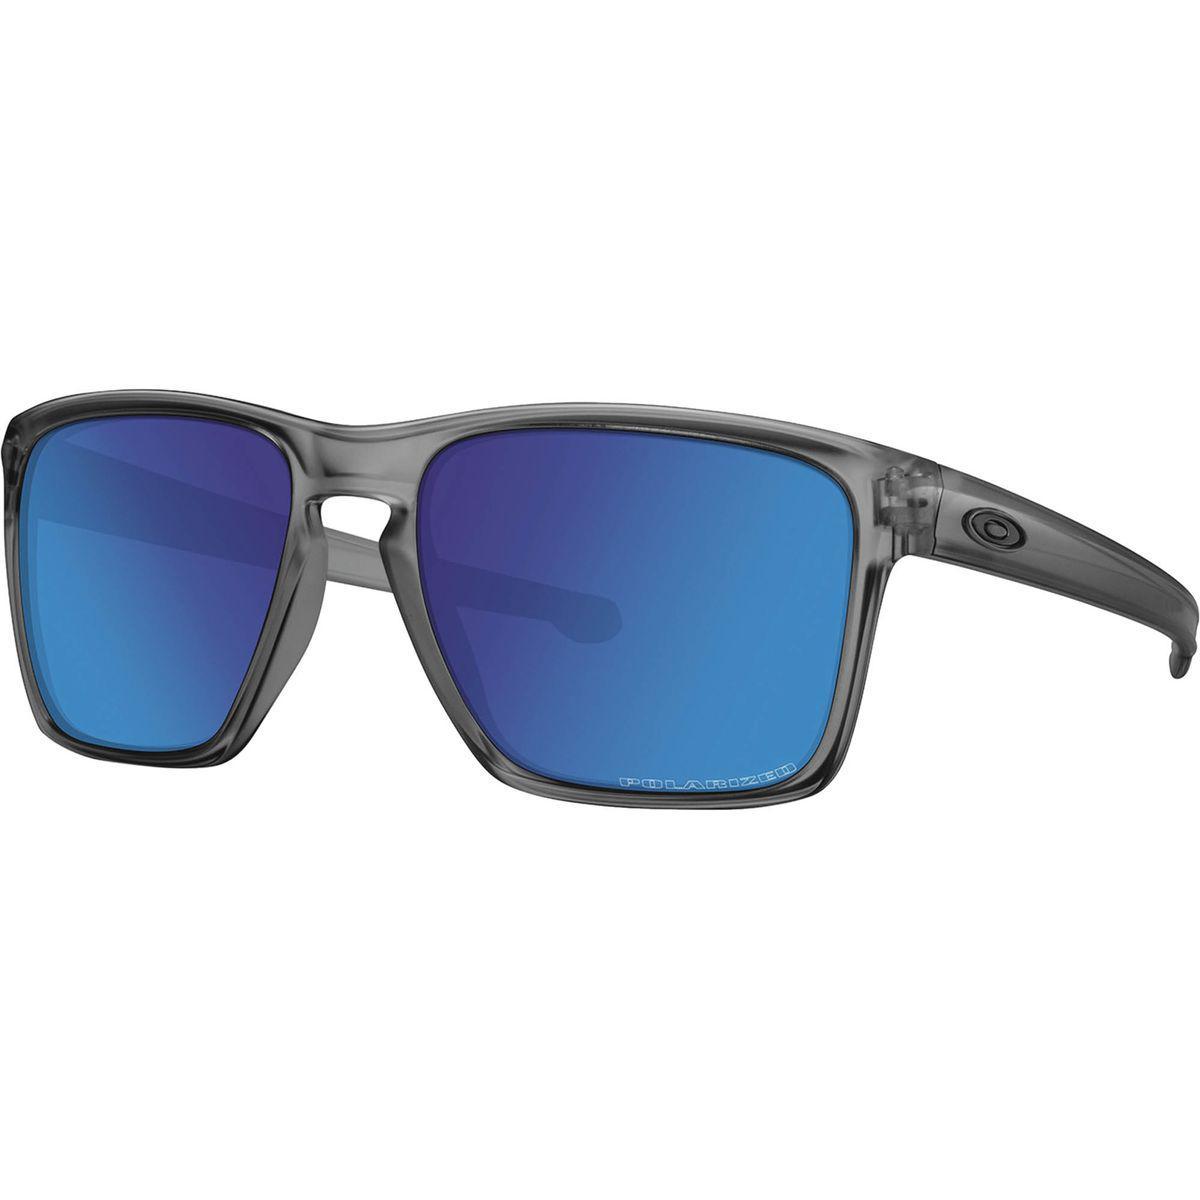 0b9d010ede9d5 Lyst - Oakley Sliver Xl Sunglasses - Polarized in Blue for Men